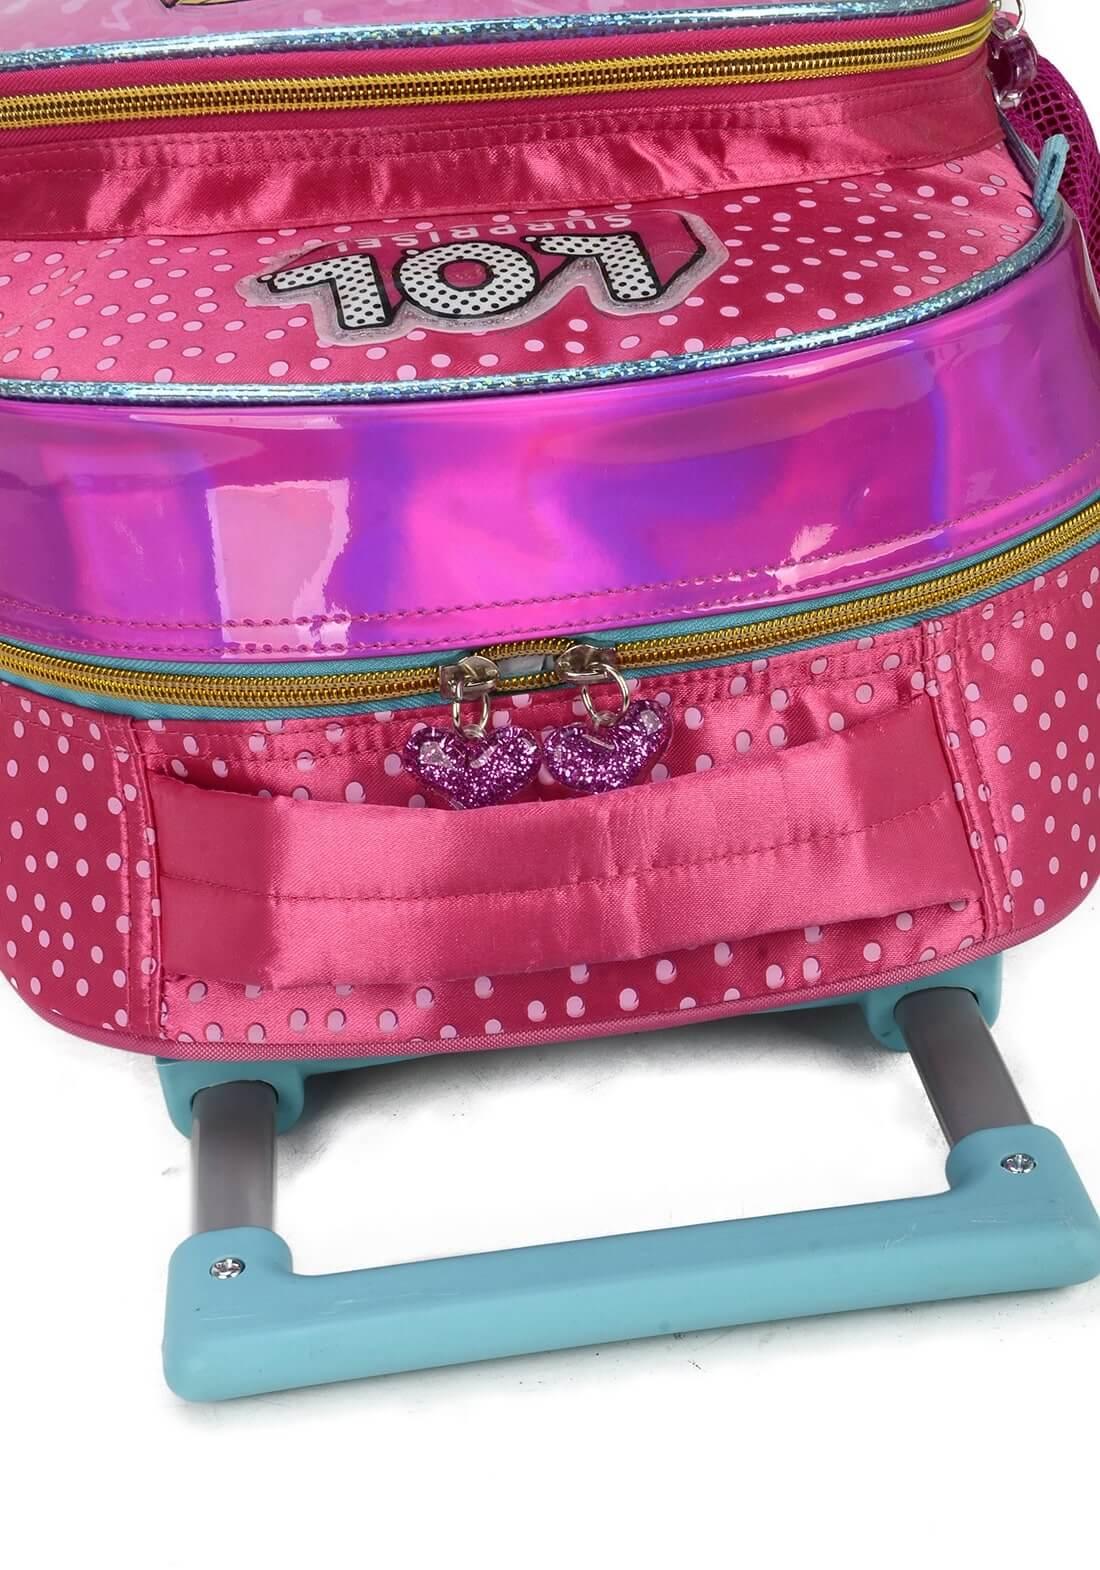 Mochila Rodinha Lol Surprise Rosa Pink Mochila Miss Original